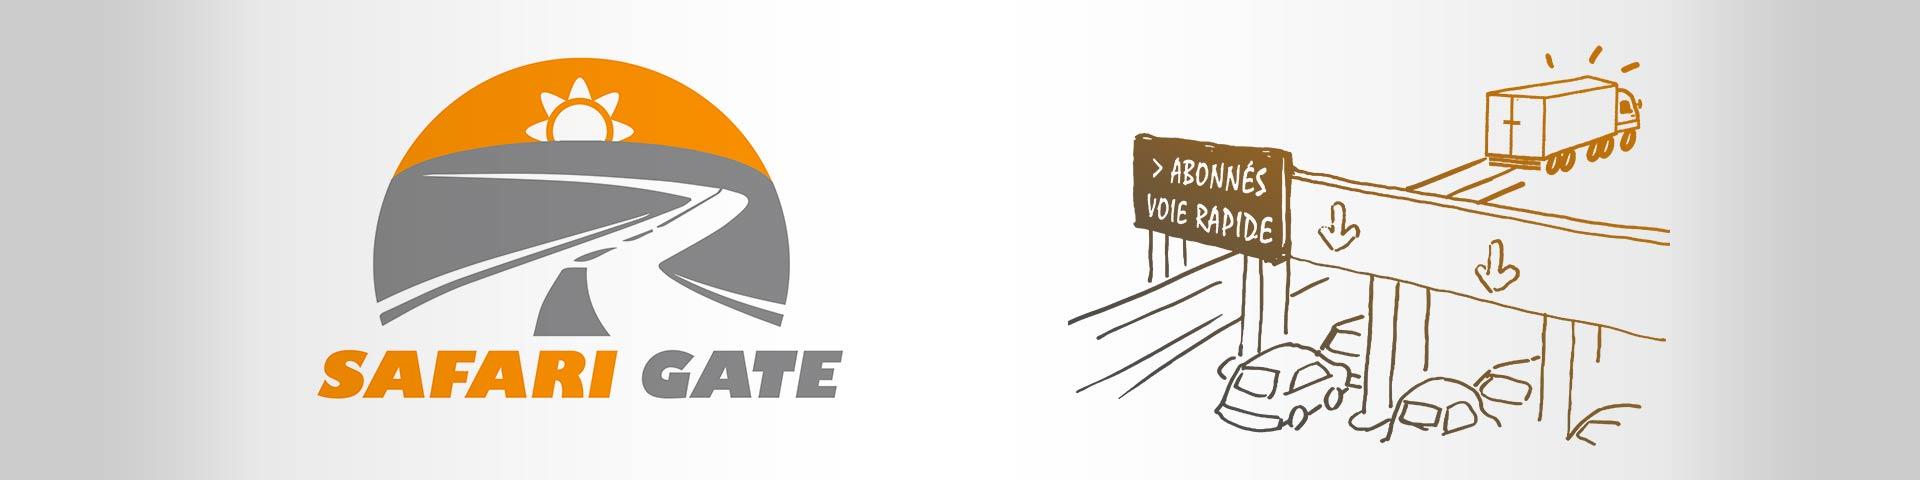 Safari Gate